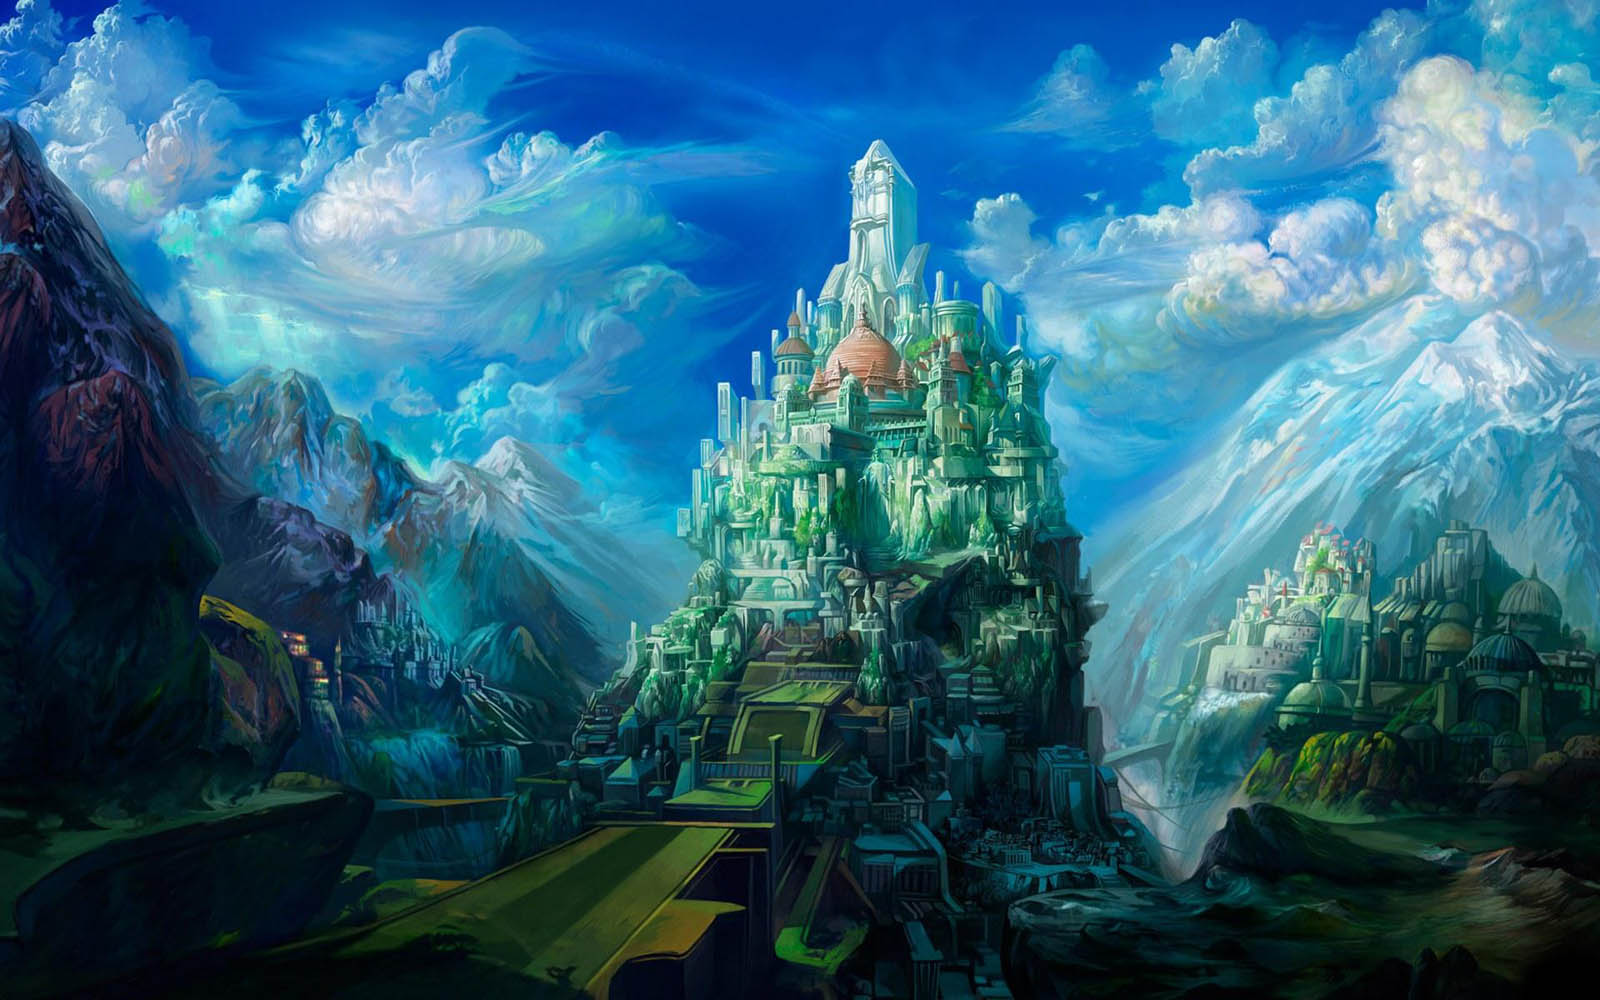 Scenery Desktop Wallpapers Fantasy Art Scenery Desktop Backgrounds 1600x1000